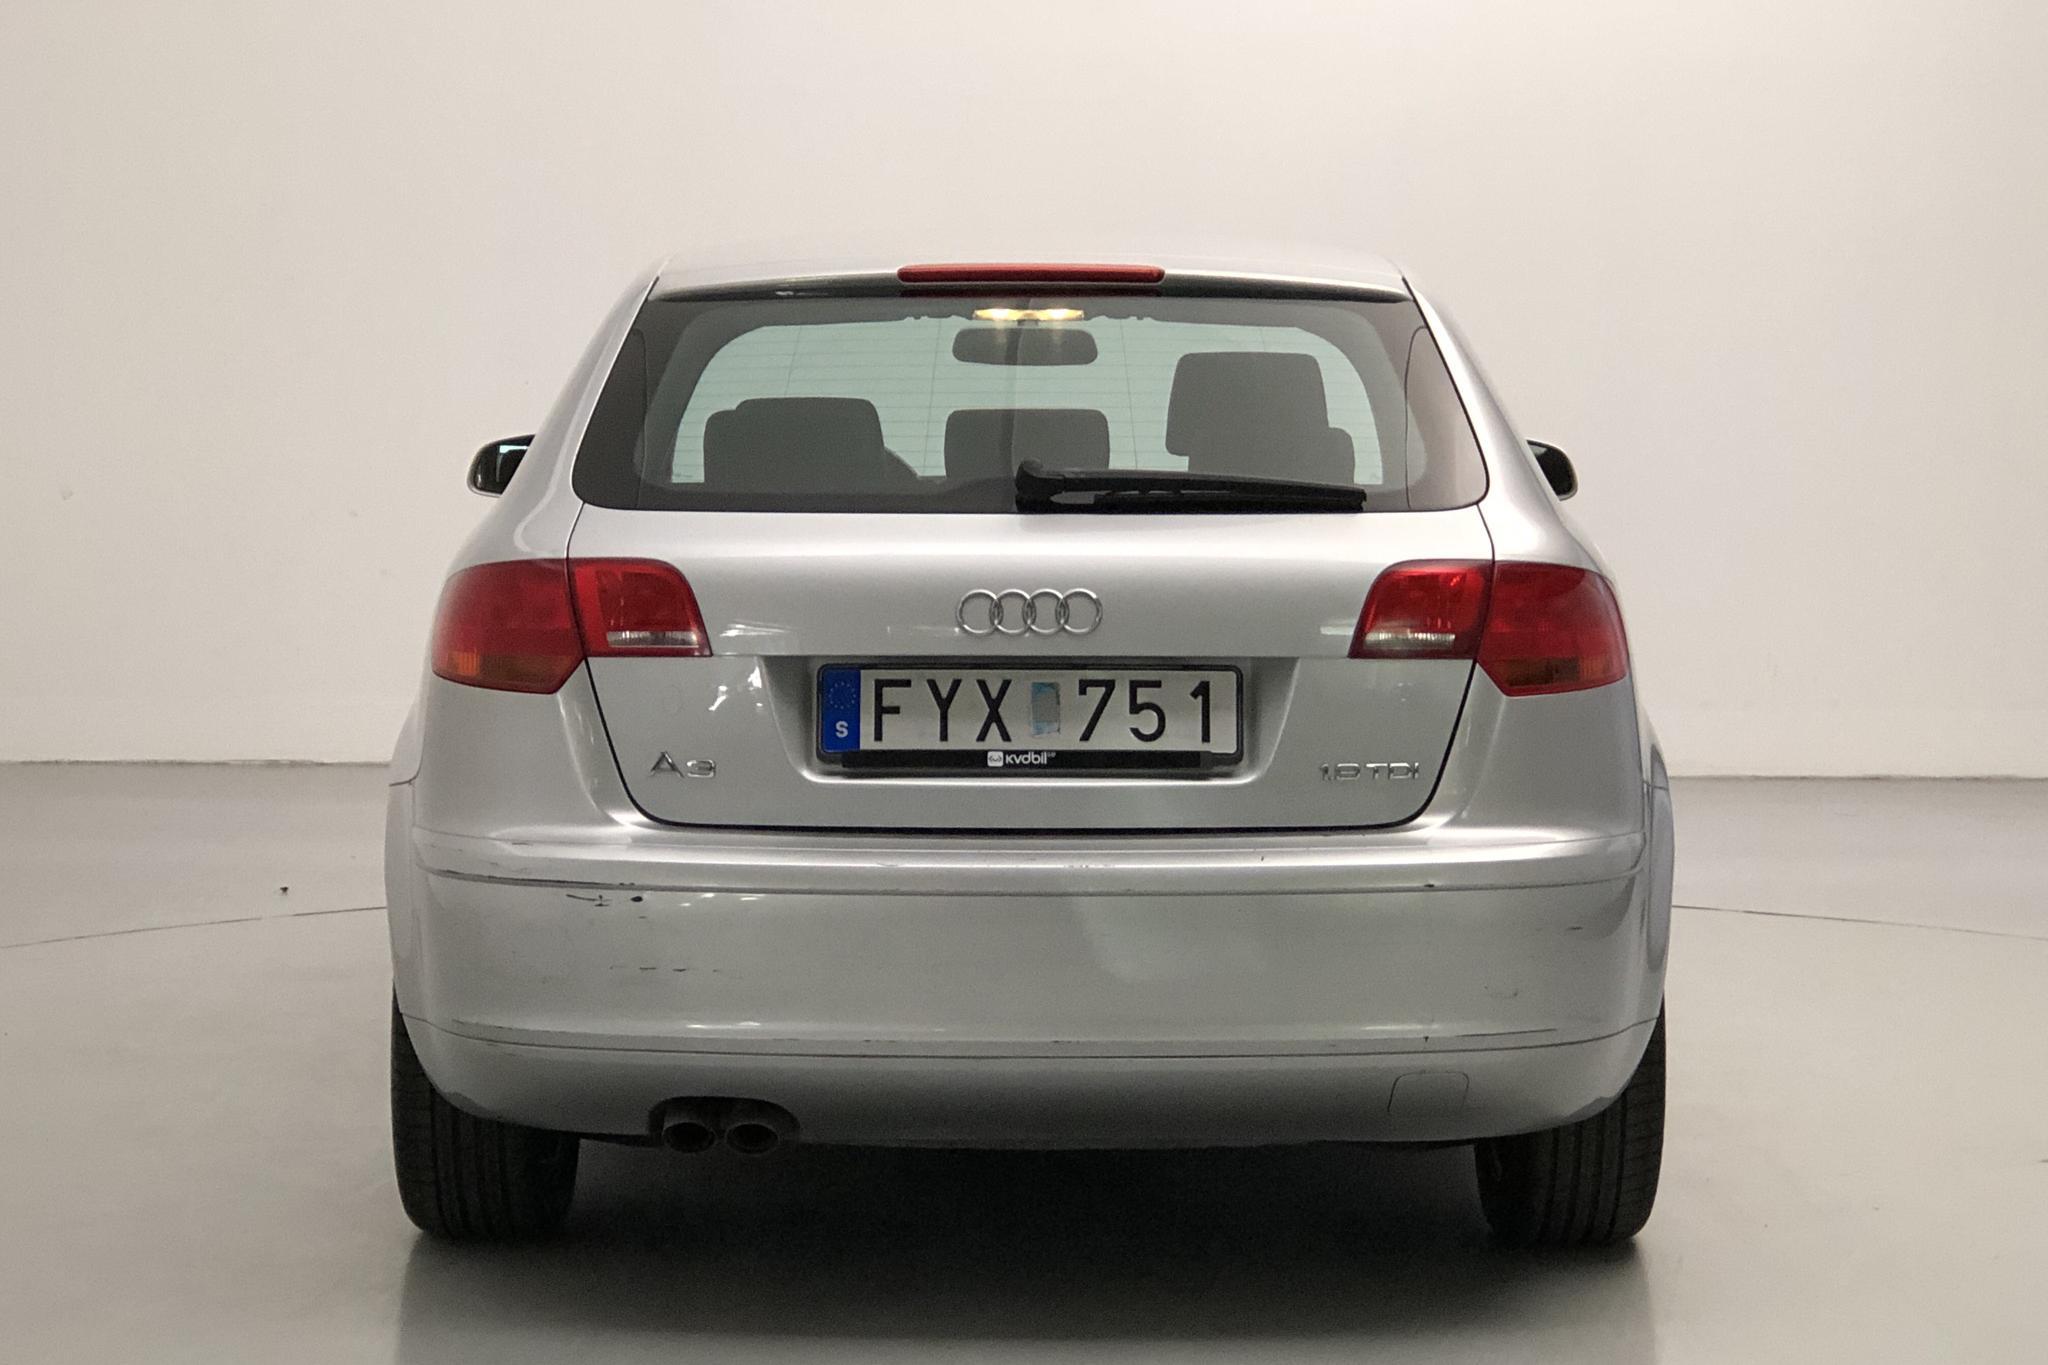 Audi A3 1.9 TDI Sportback (105hk) - 159 670 km - Manual - silver - 2008